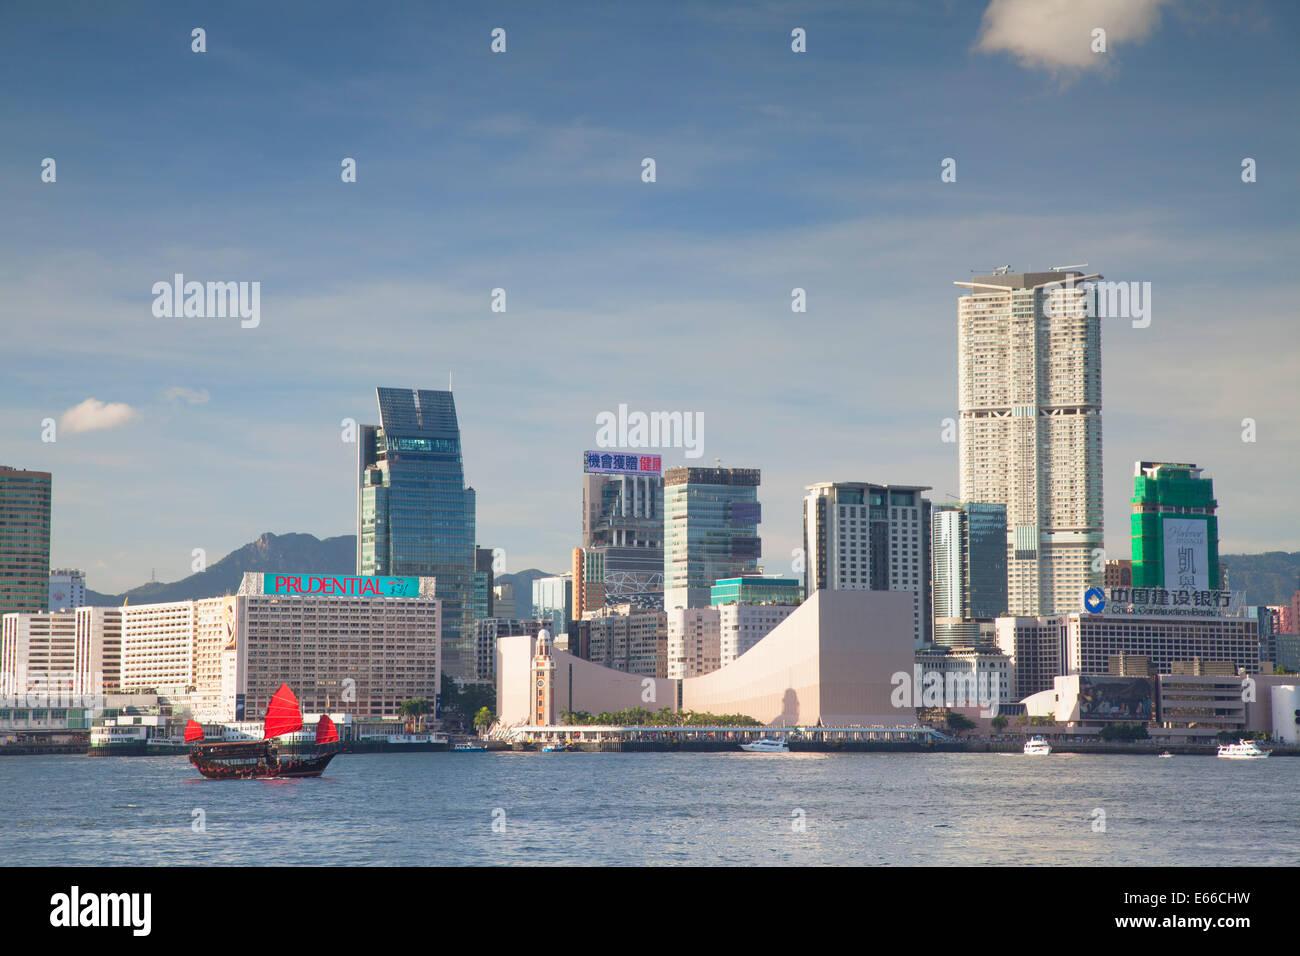 Dschunke vorbei Tsim Sha Tsui Skyline, Kowloon, Hongkong Stockbild